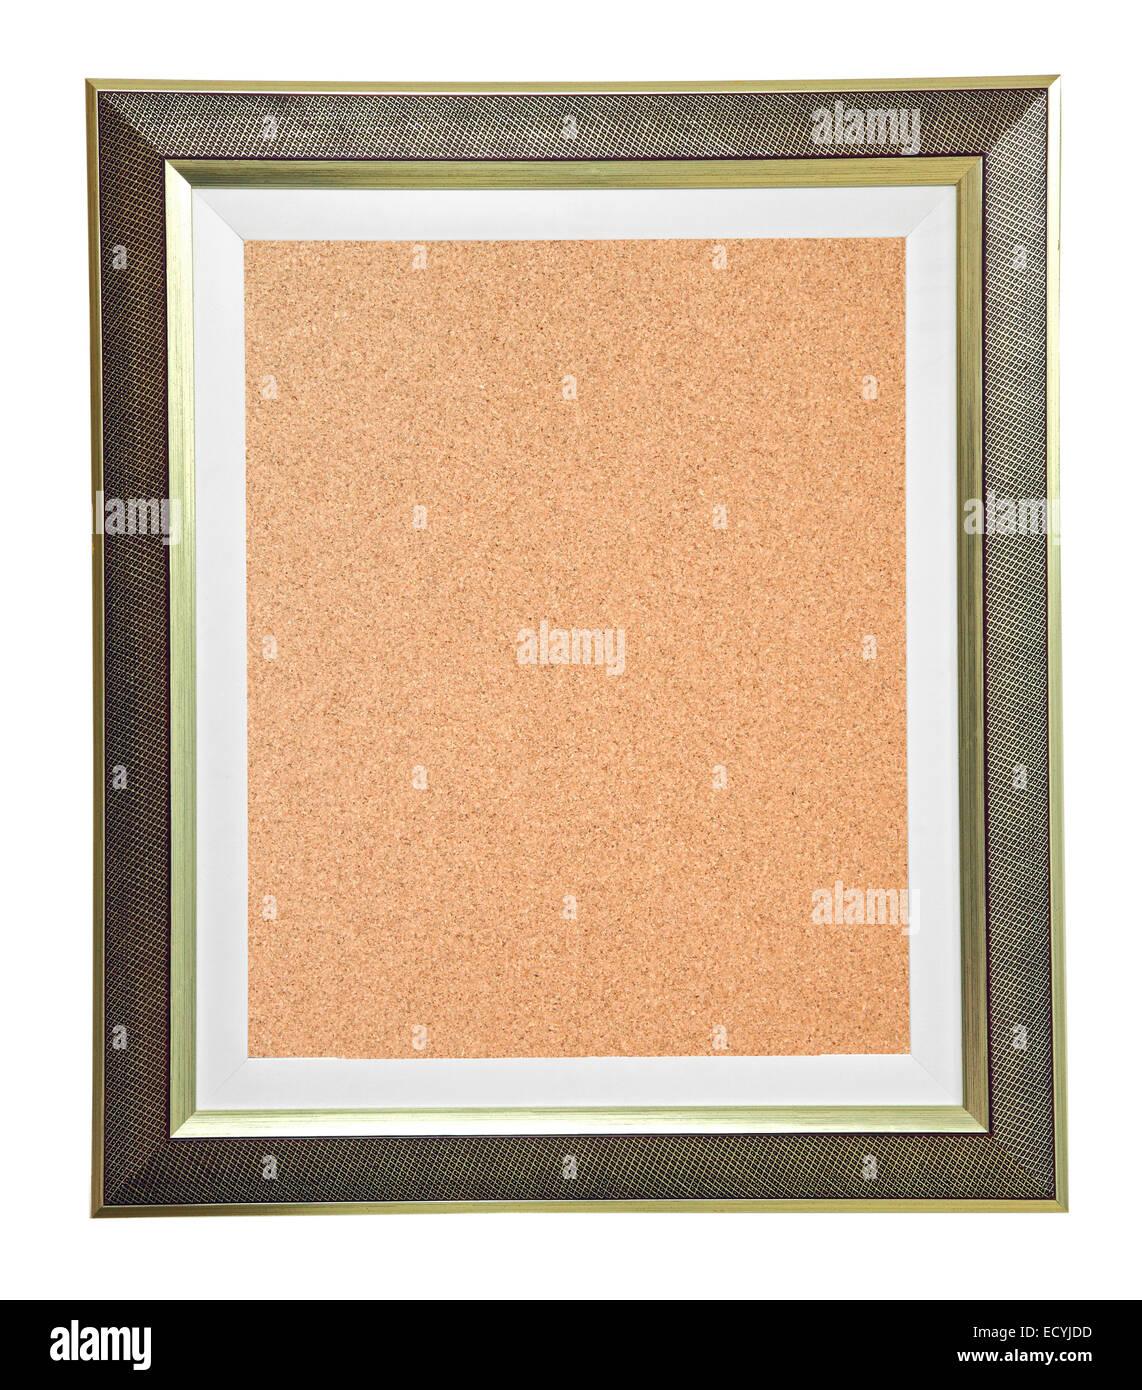 isolierte Kork Pinnwand mit modernen Rahmen Stockfoto, Bild ...